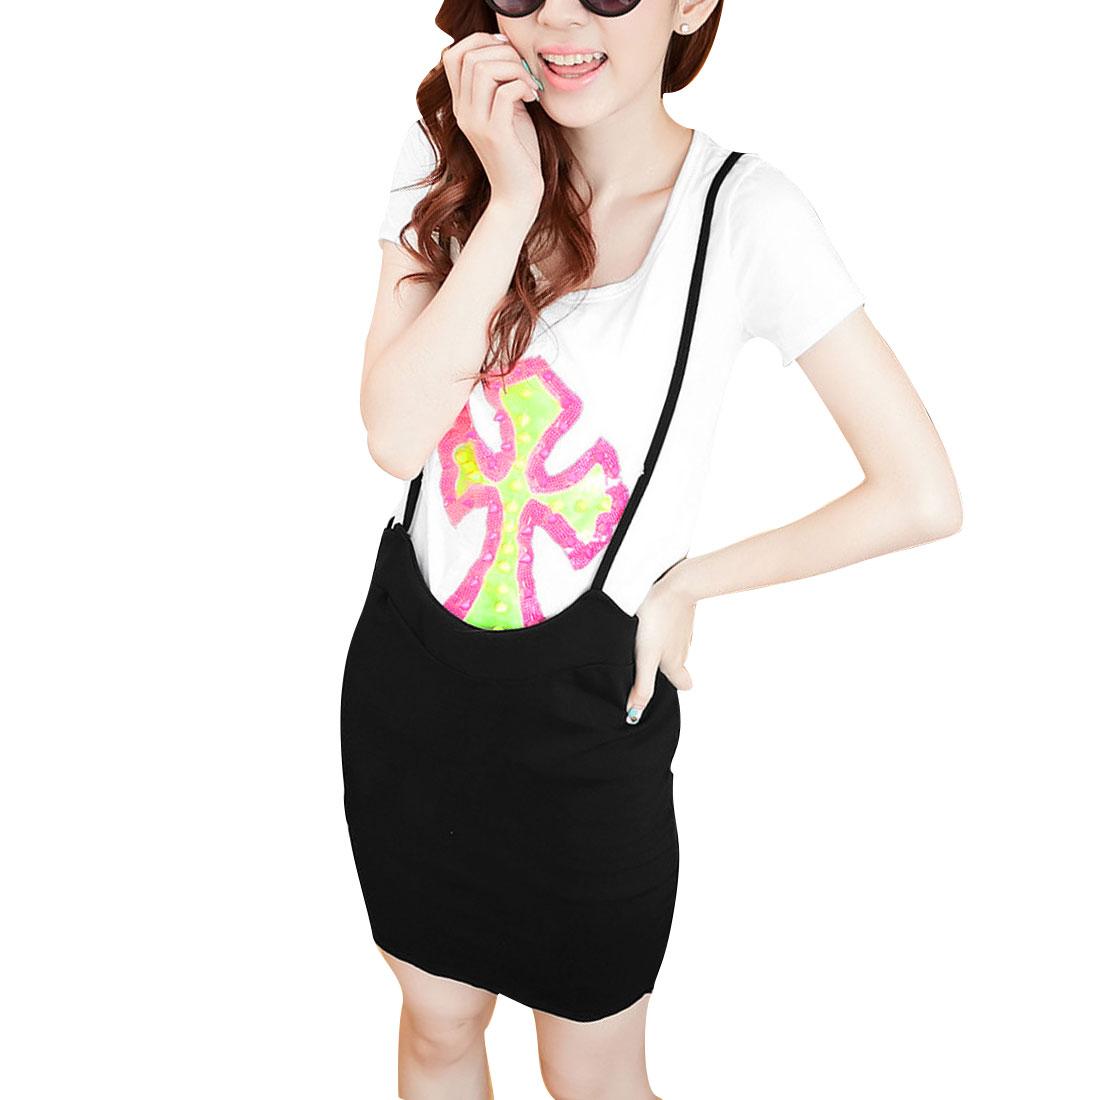 Woman Round Neck Short Sleeve White Shirt w Black Suspender Skirt XS